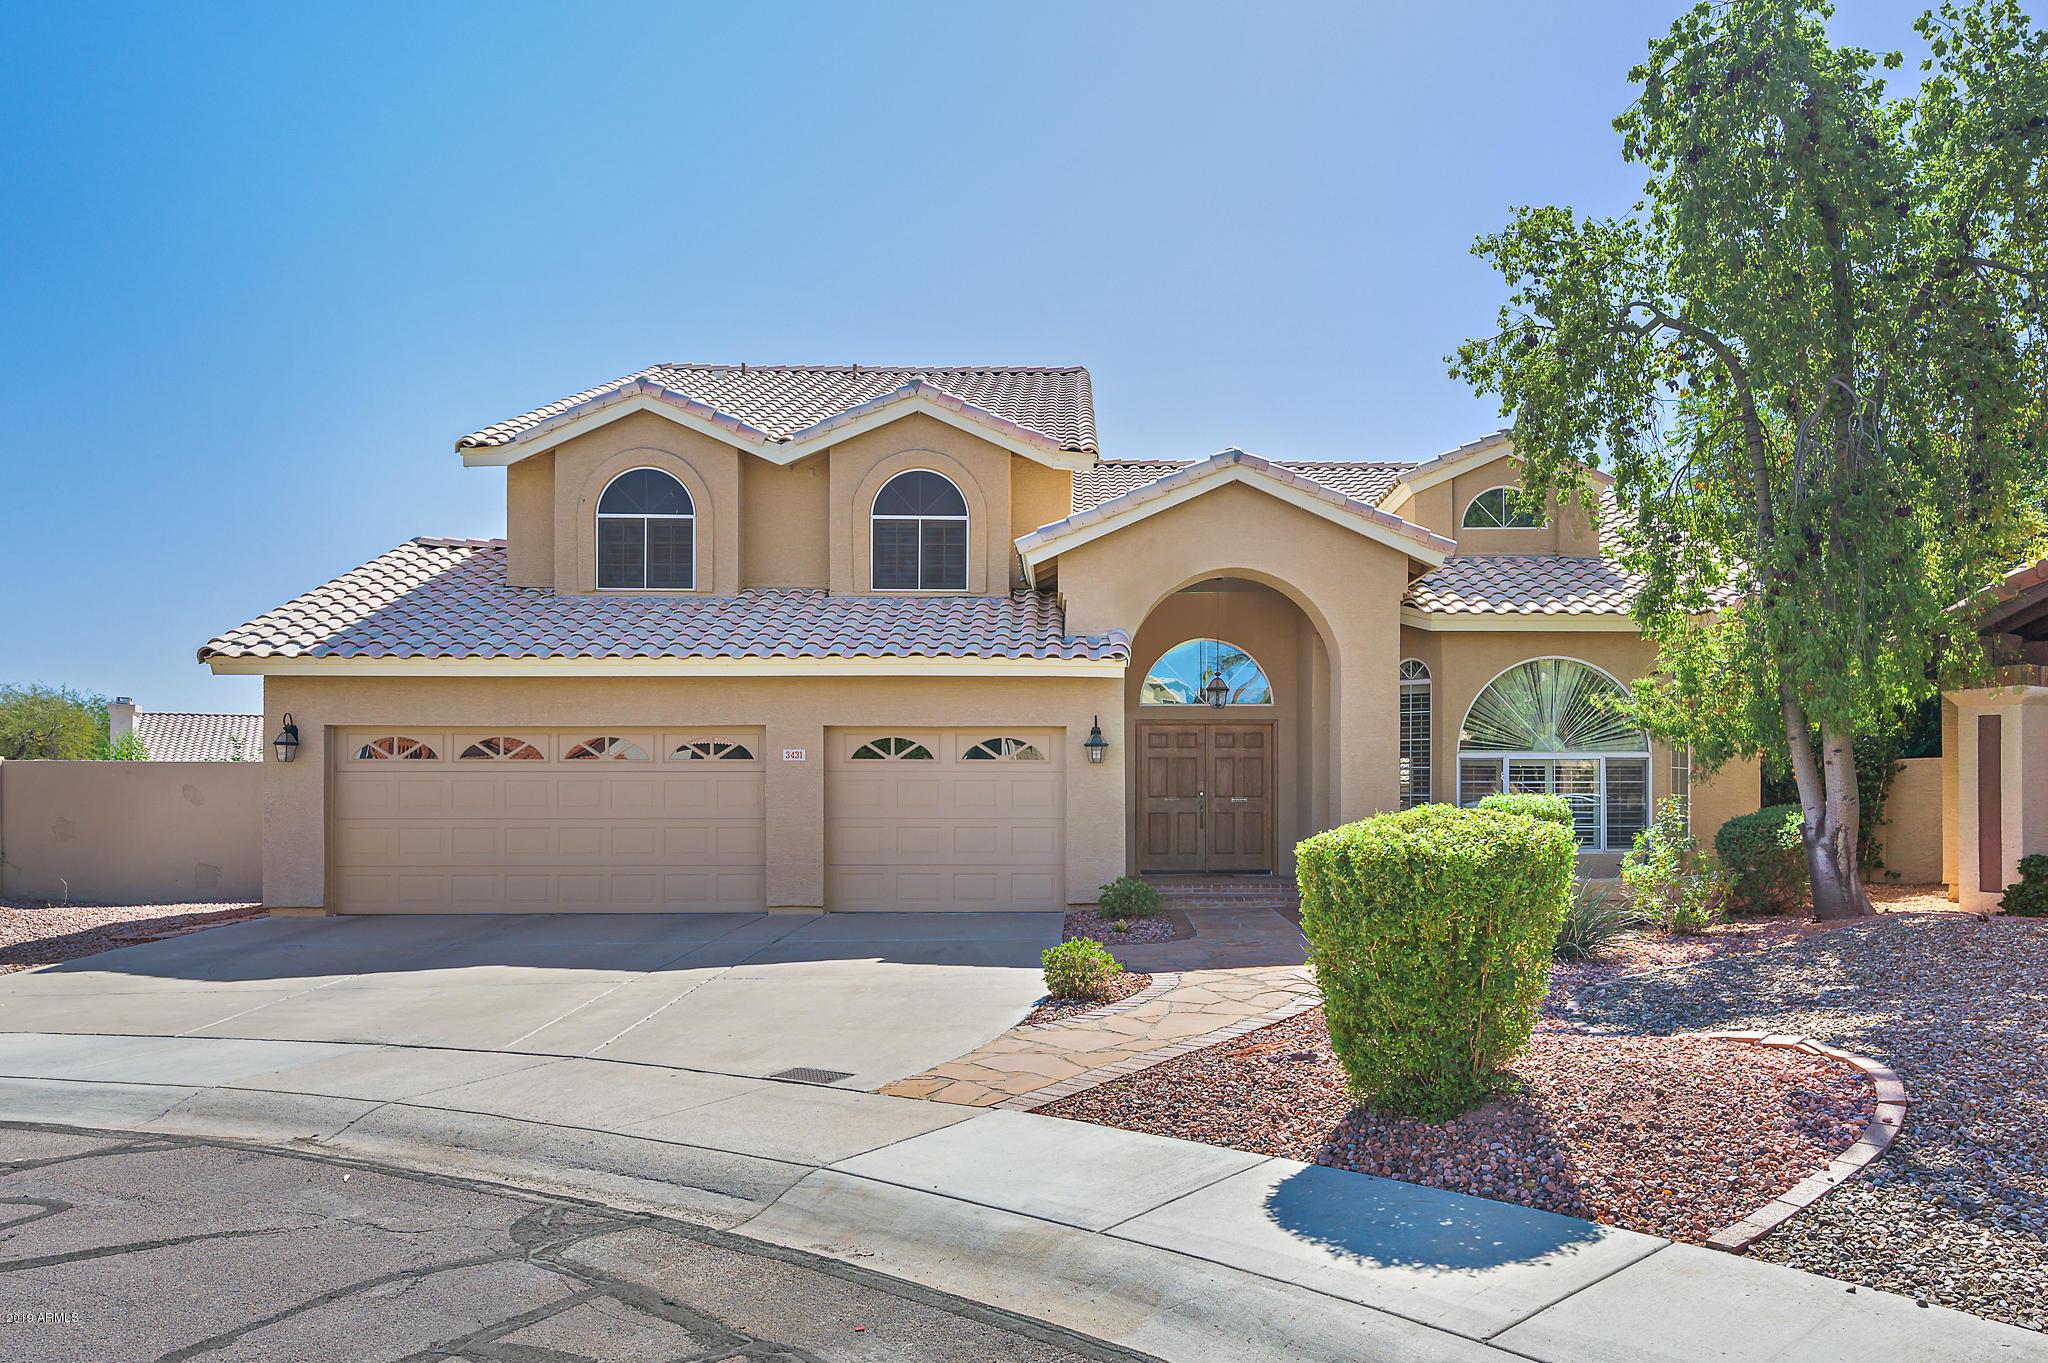 Photo of 3431 E DESERT WILLOW Road, Phoenix, AZ 85044